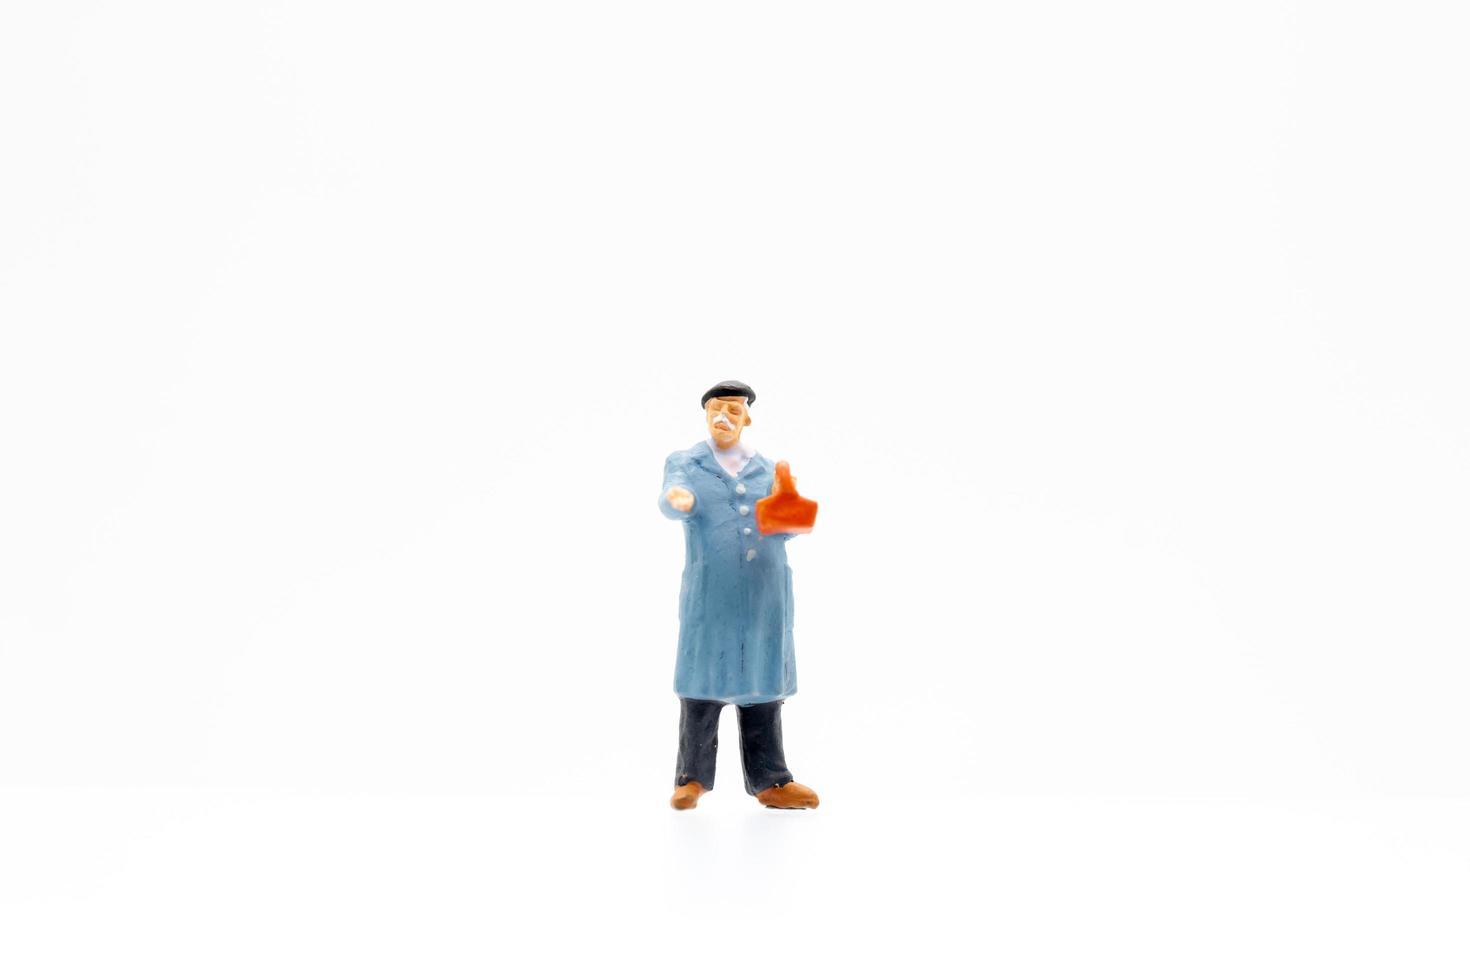 uomo in miniatura su sfondo bianco foto